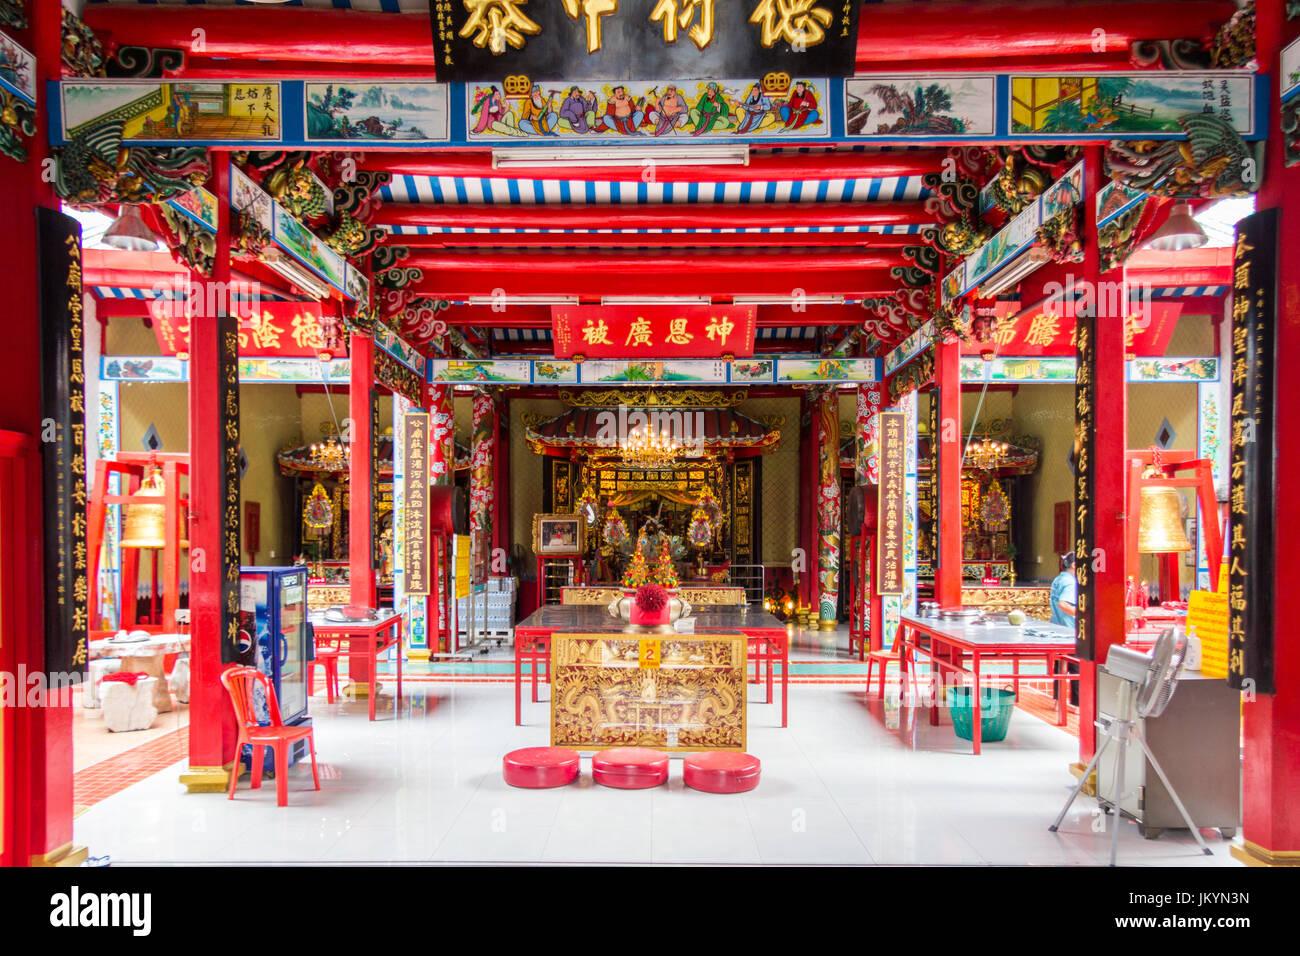 Interior of chinese temple Chinatown, Bangkok, Thailand Stock Photo: 149970681 - Alamy